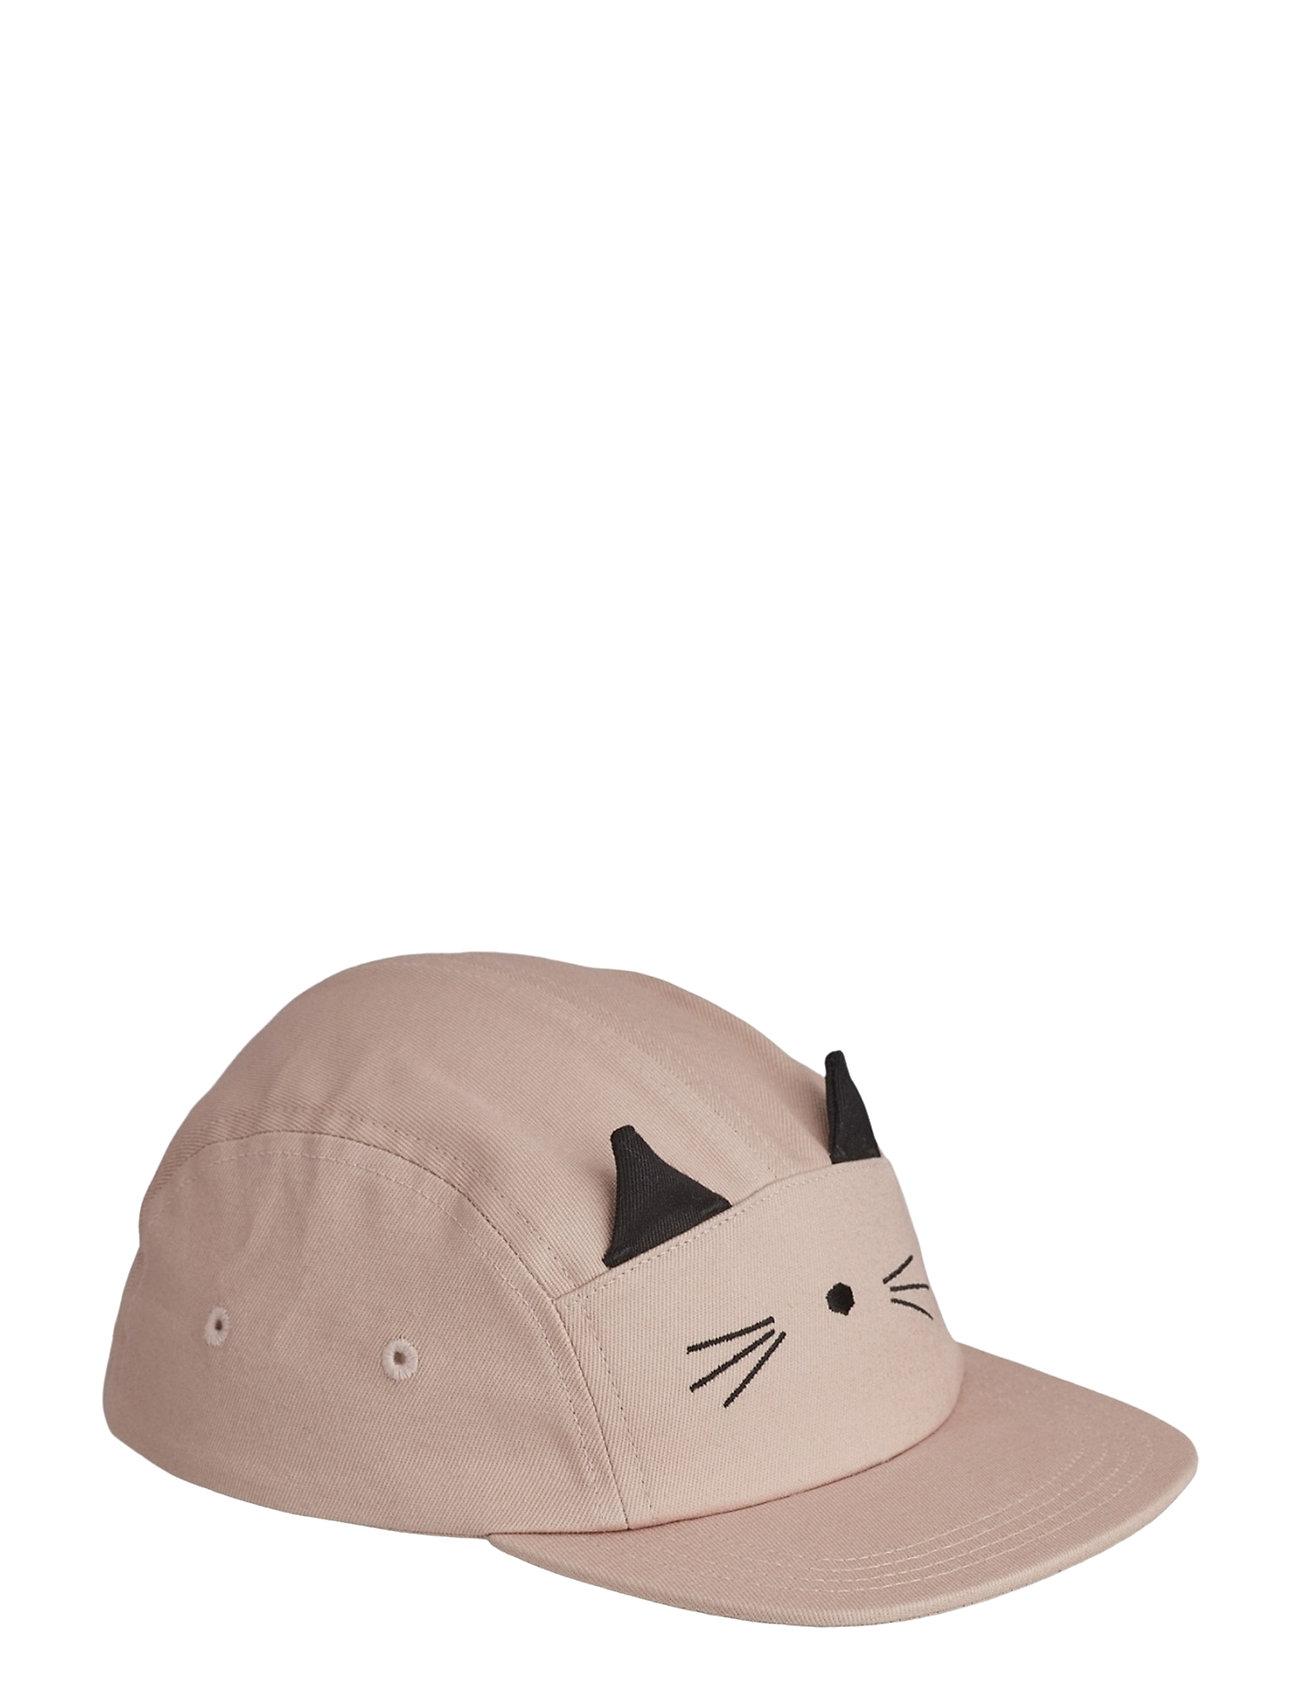 Liewood Rory cap - CAT ROSE